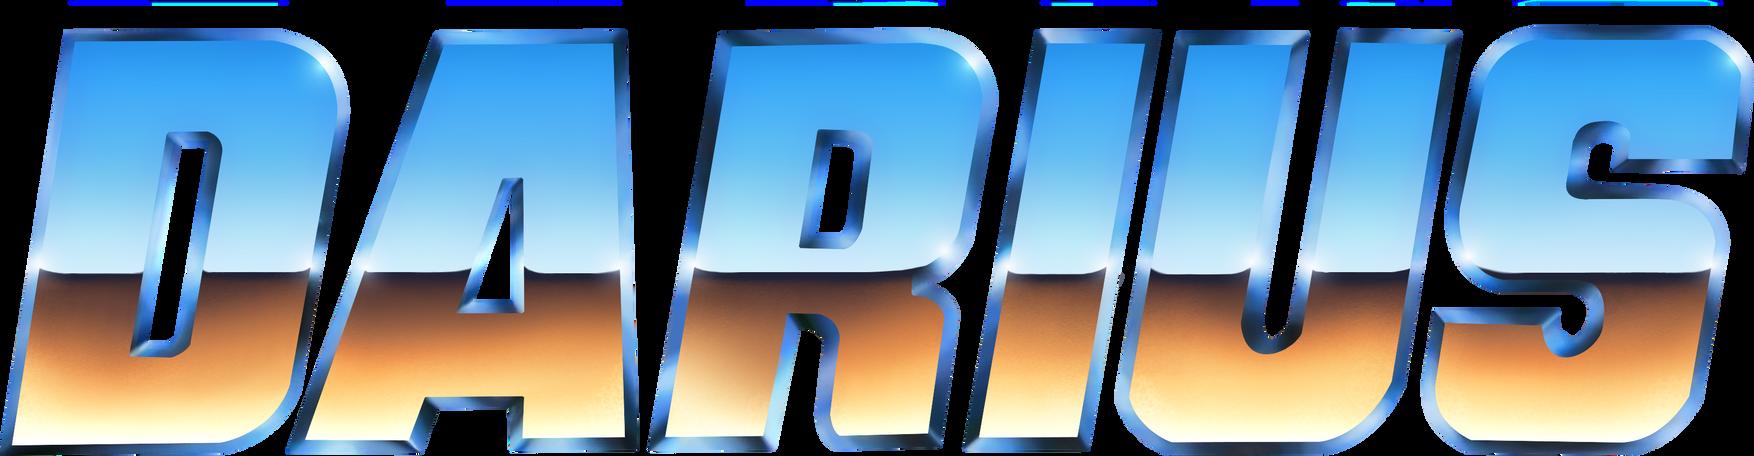 Darius (nec Version) re-created logo by Anarkhya